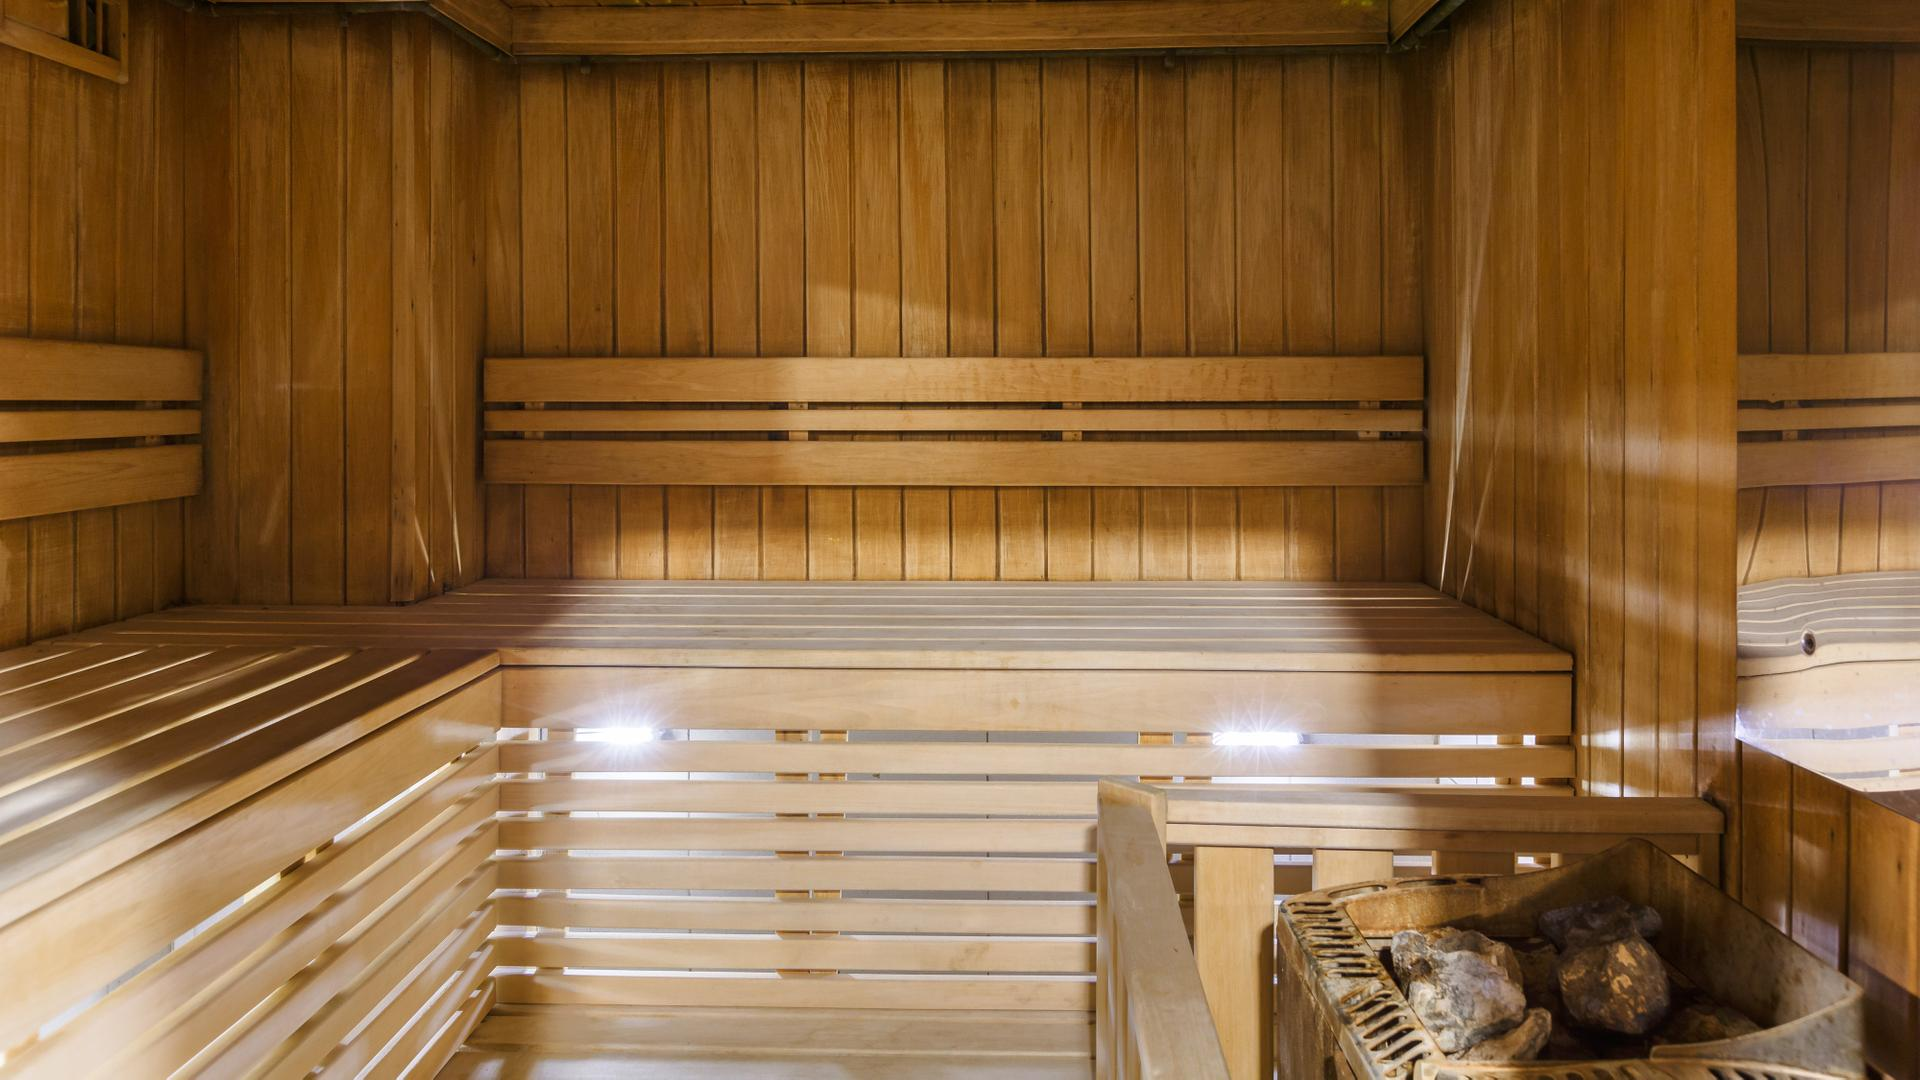 Баня по финской технологии: разбираем отличие финской бани от русской